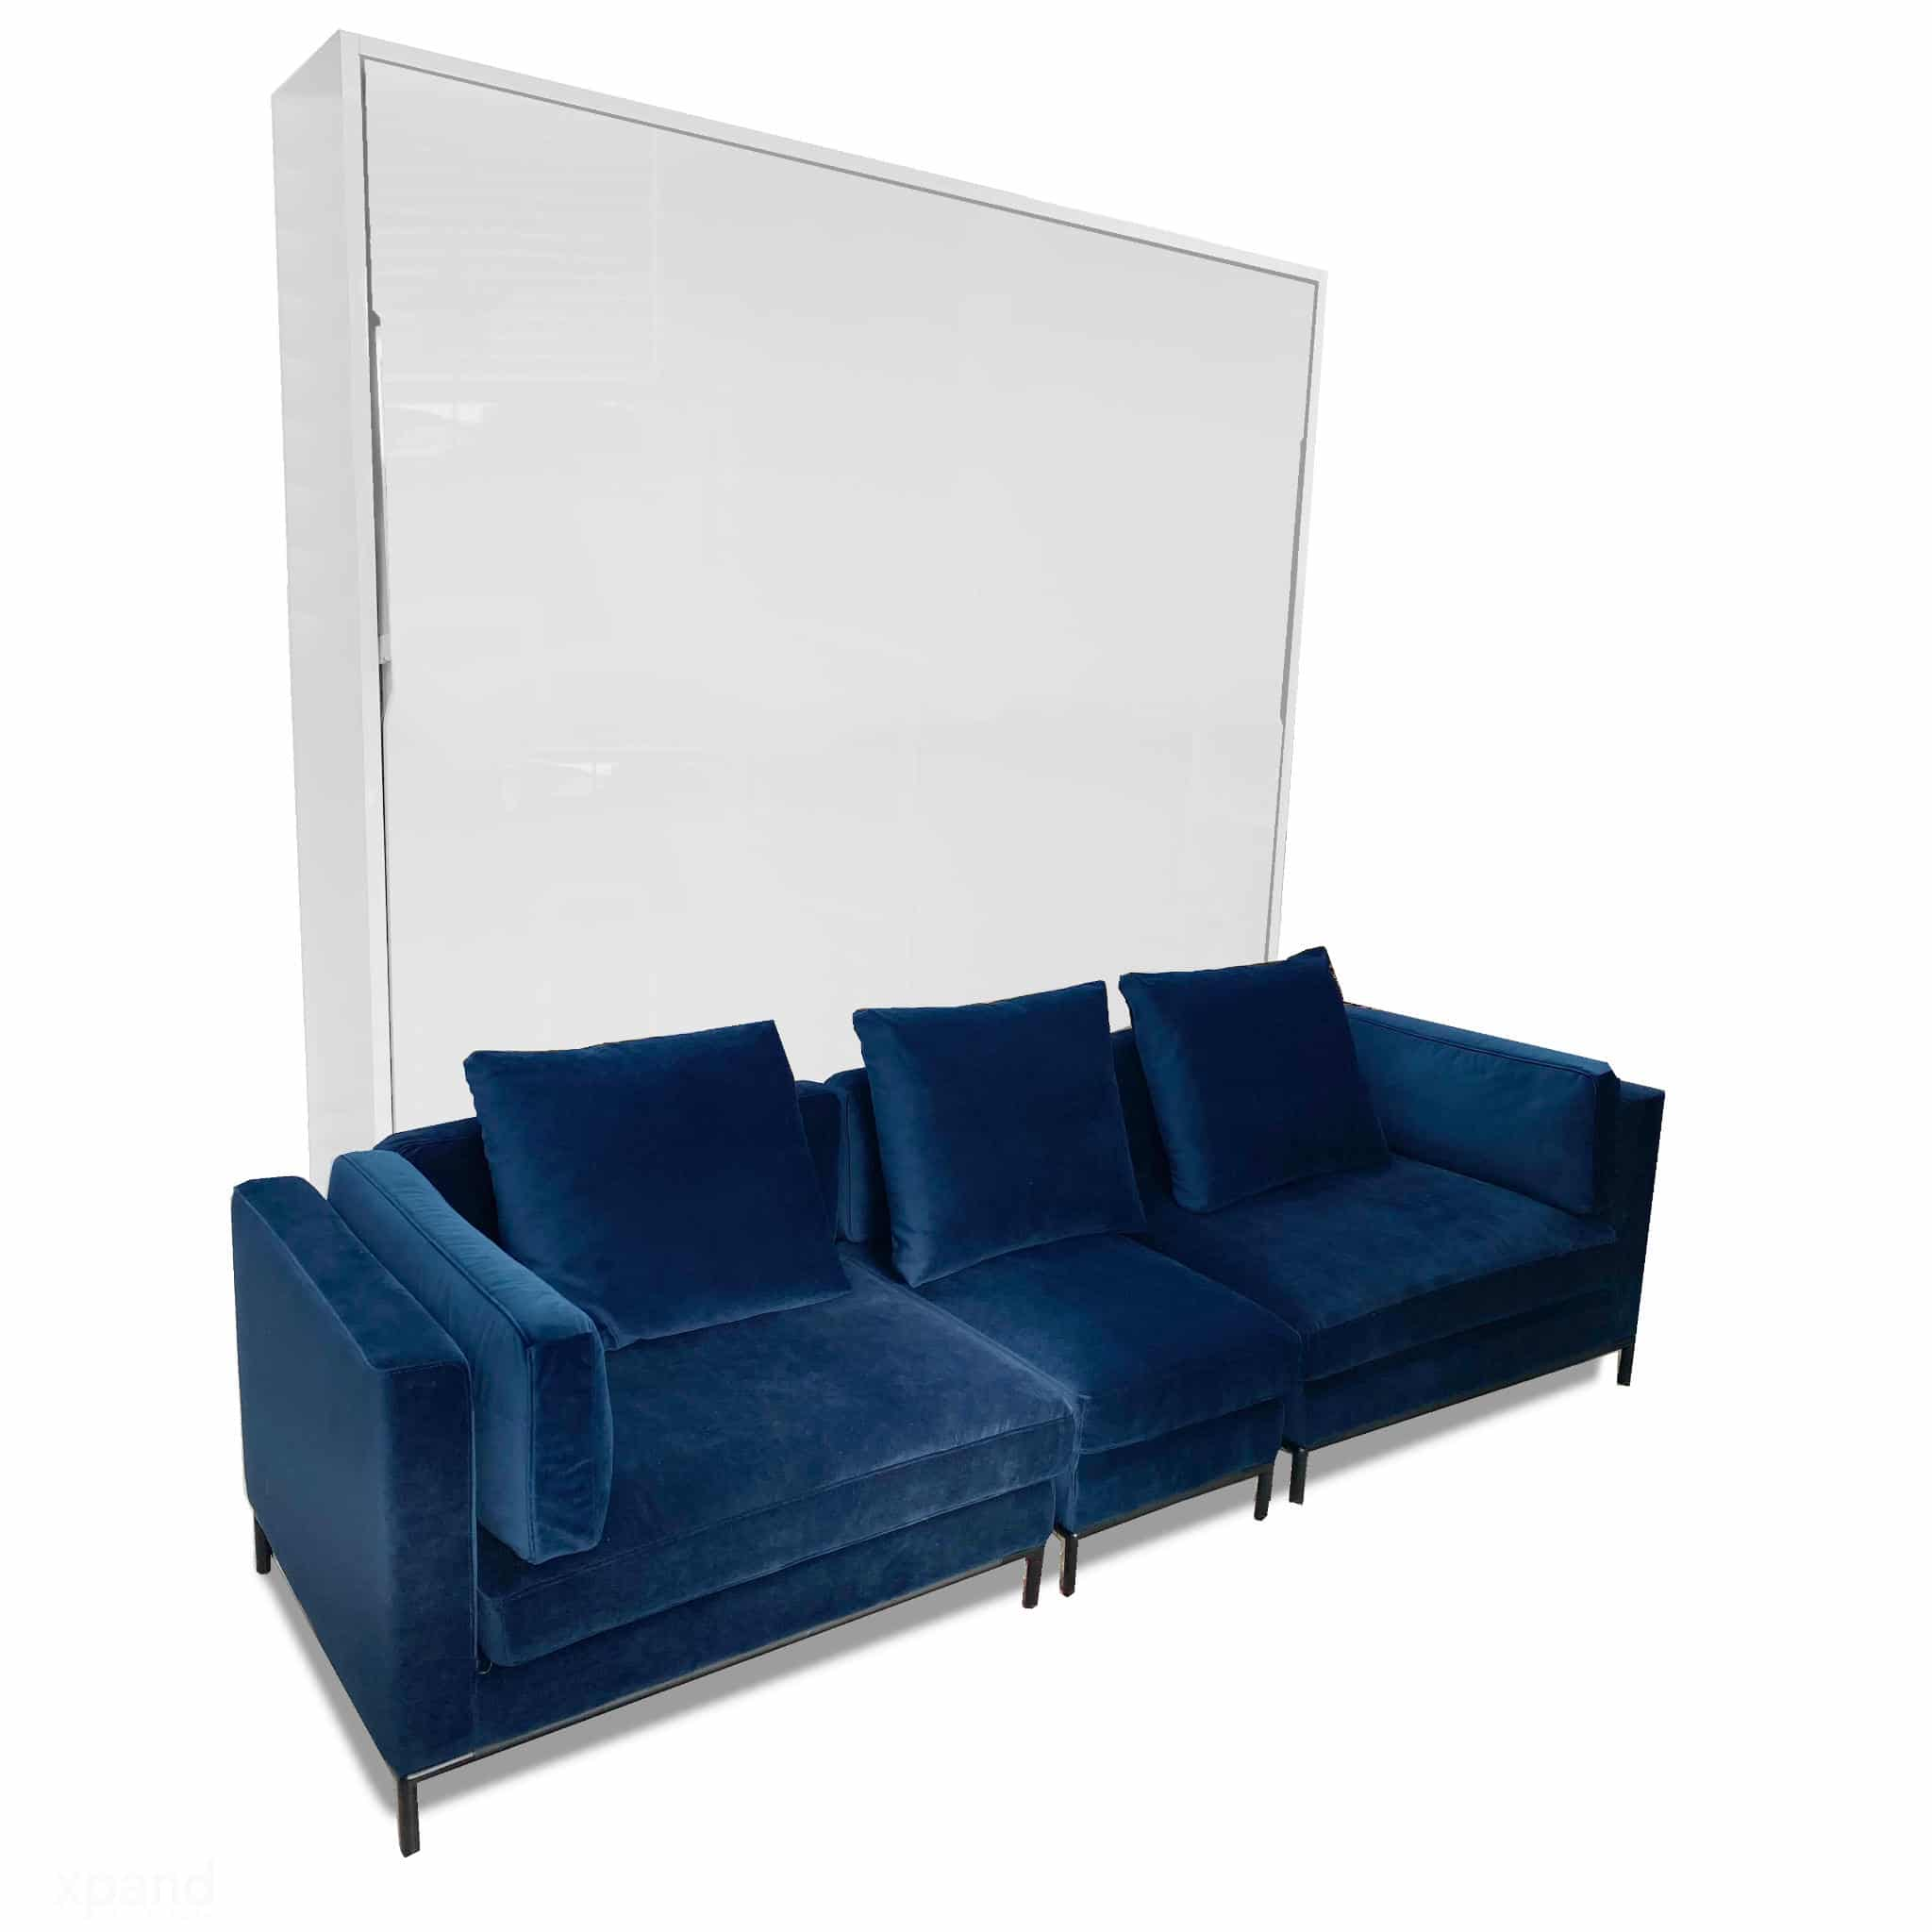 murphysofa navy blue migliore modular king size wall bed sofa